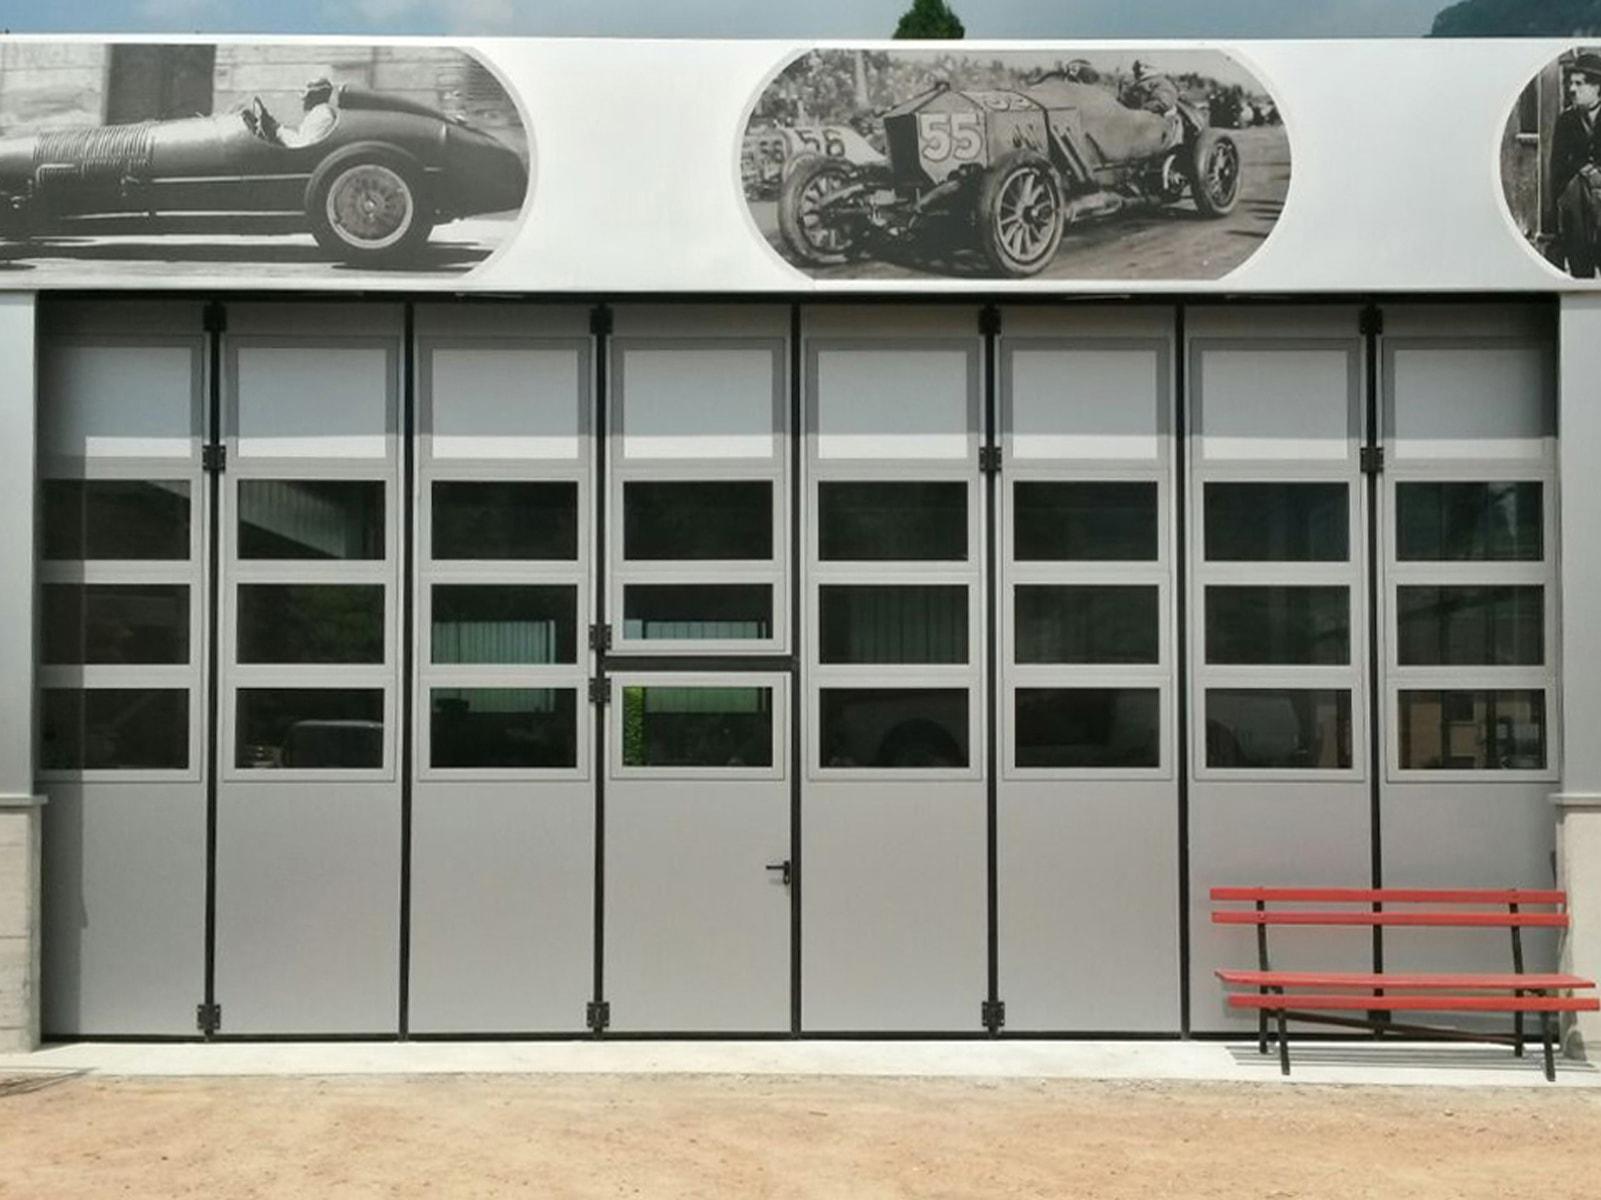 Portone a libro industriale ADONE - Bianco-grigio con vetrature